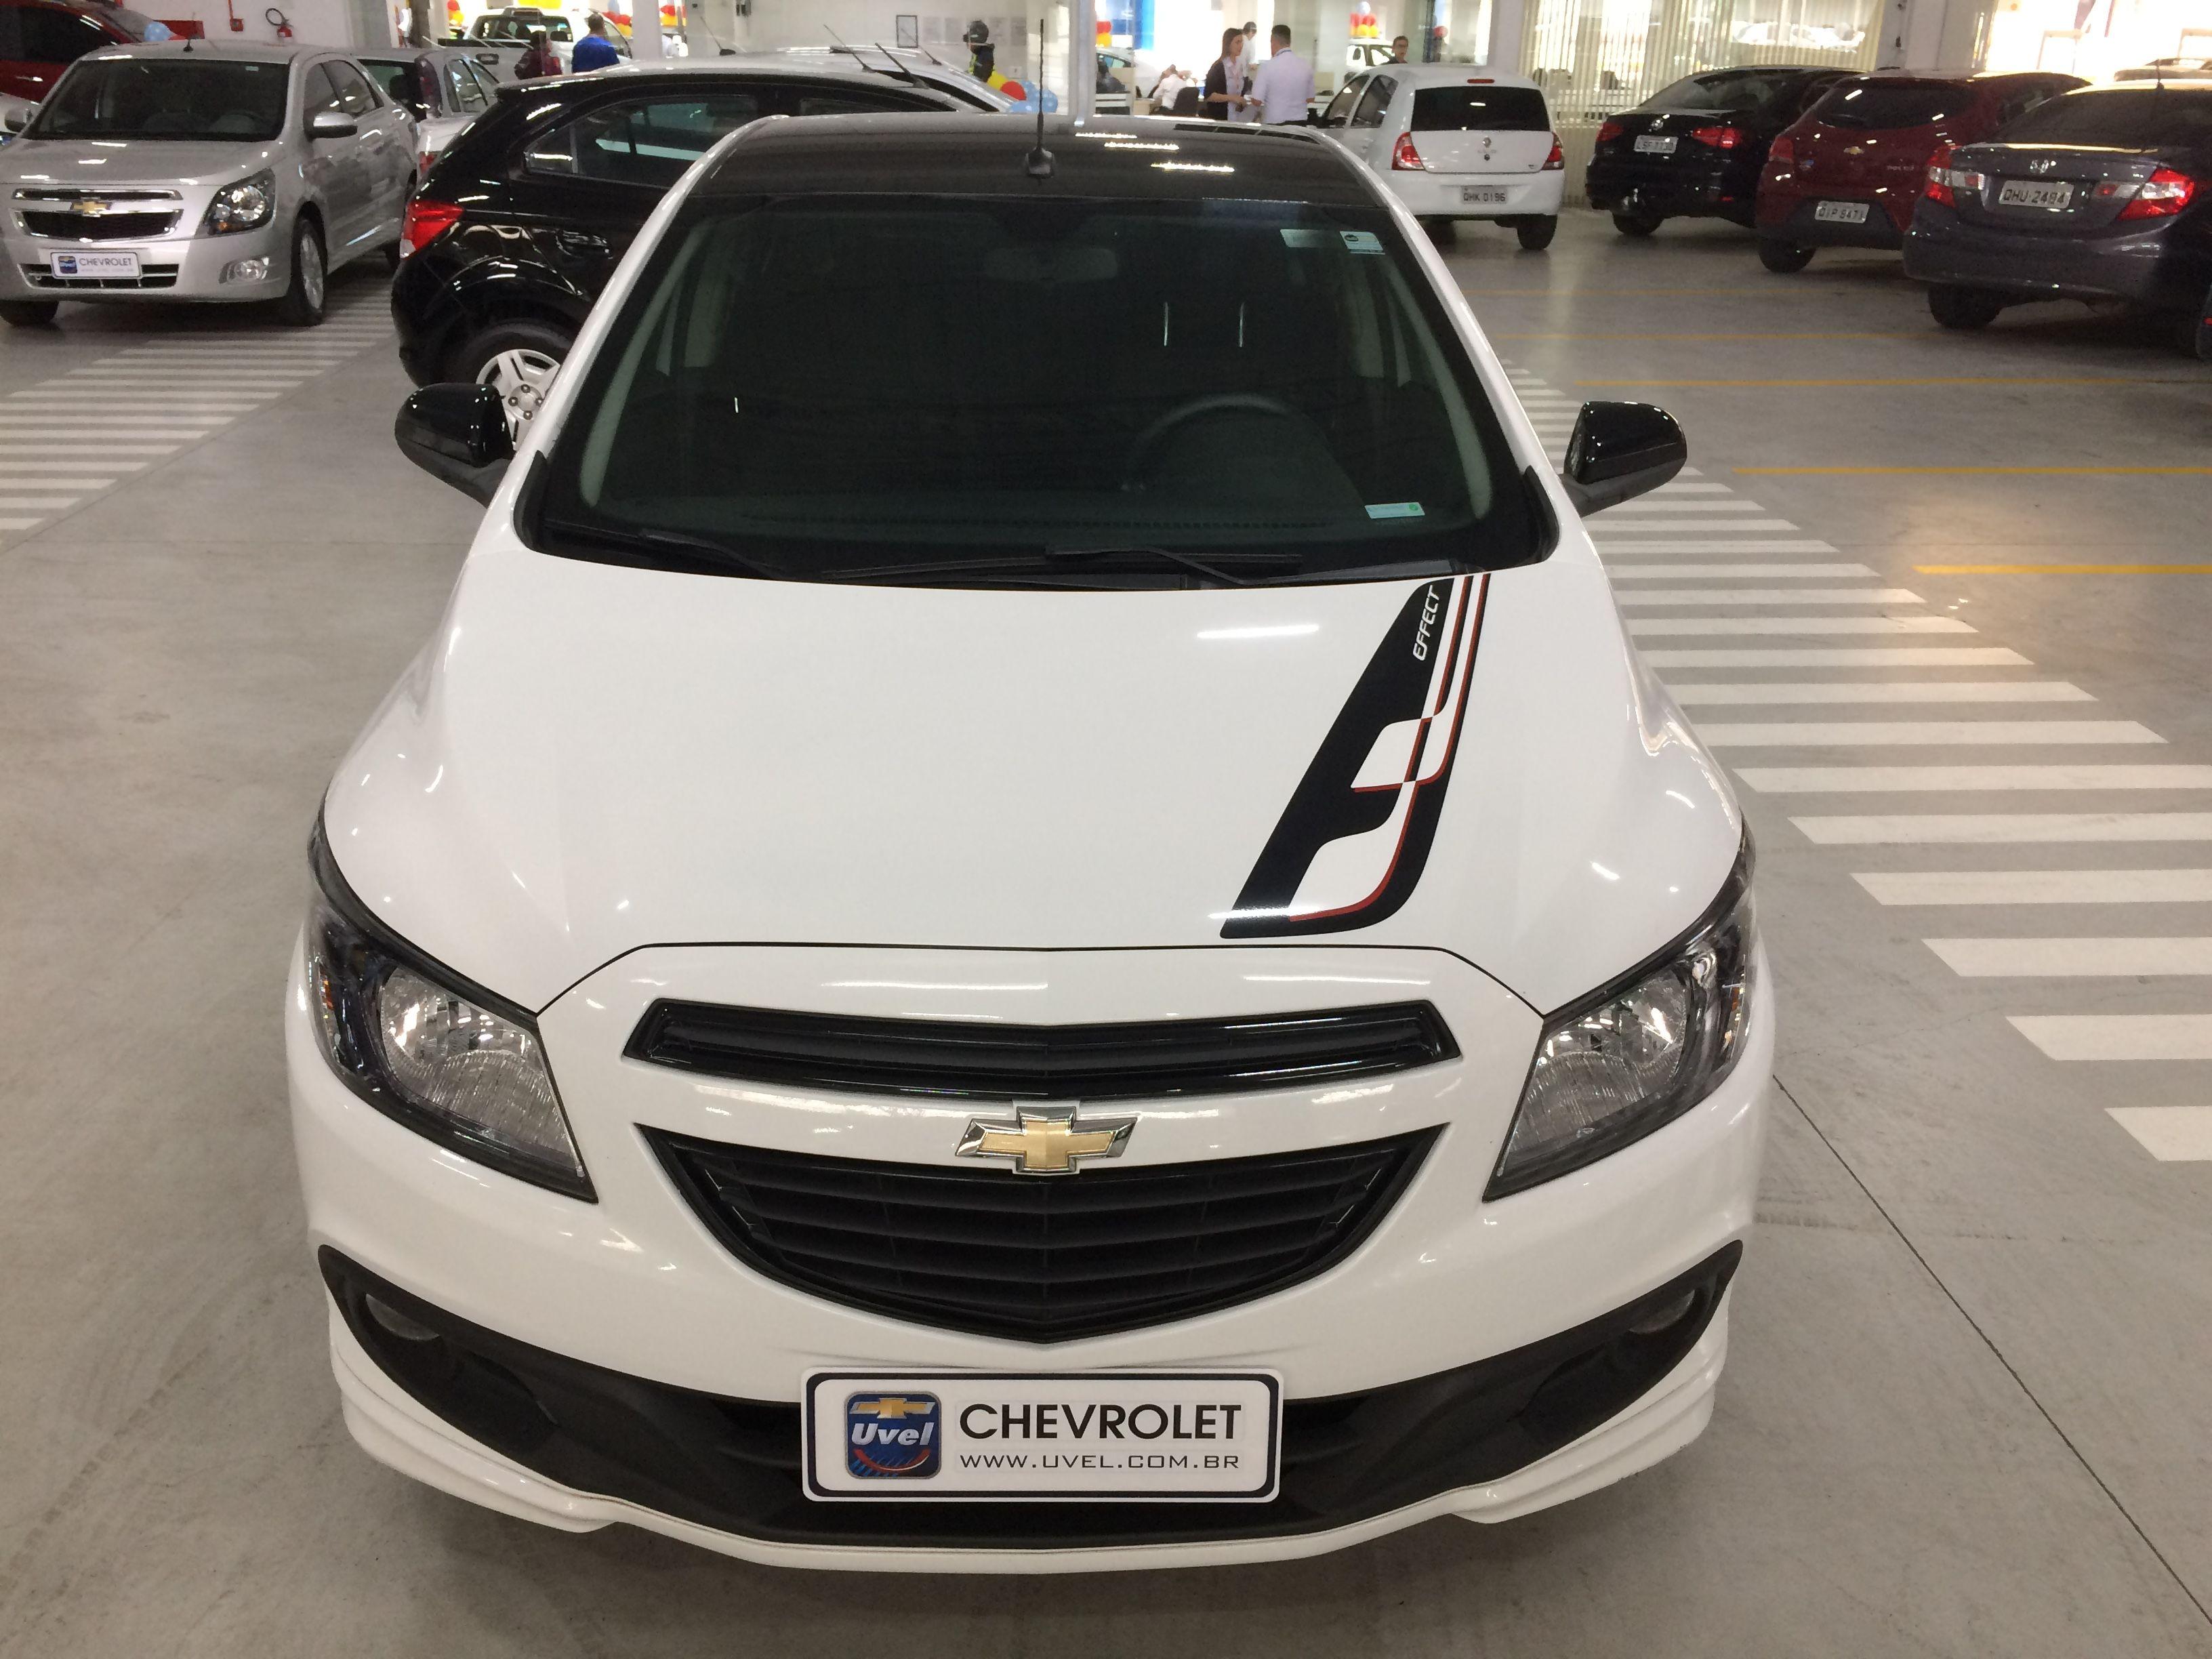 Chevrolet ONIX EFFECT 1.4 2015